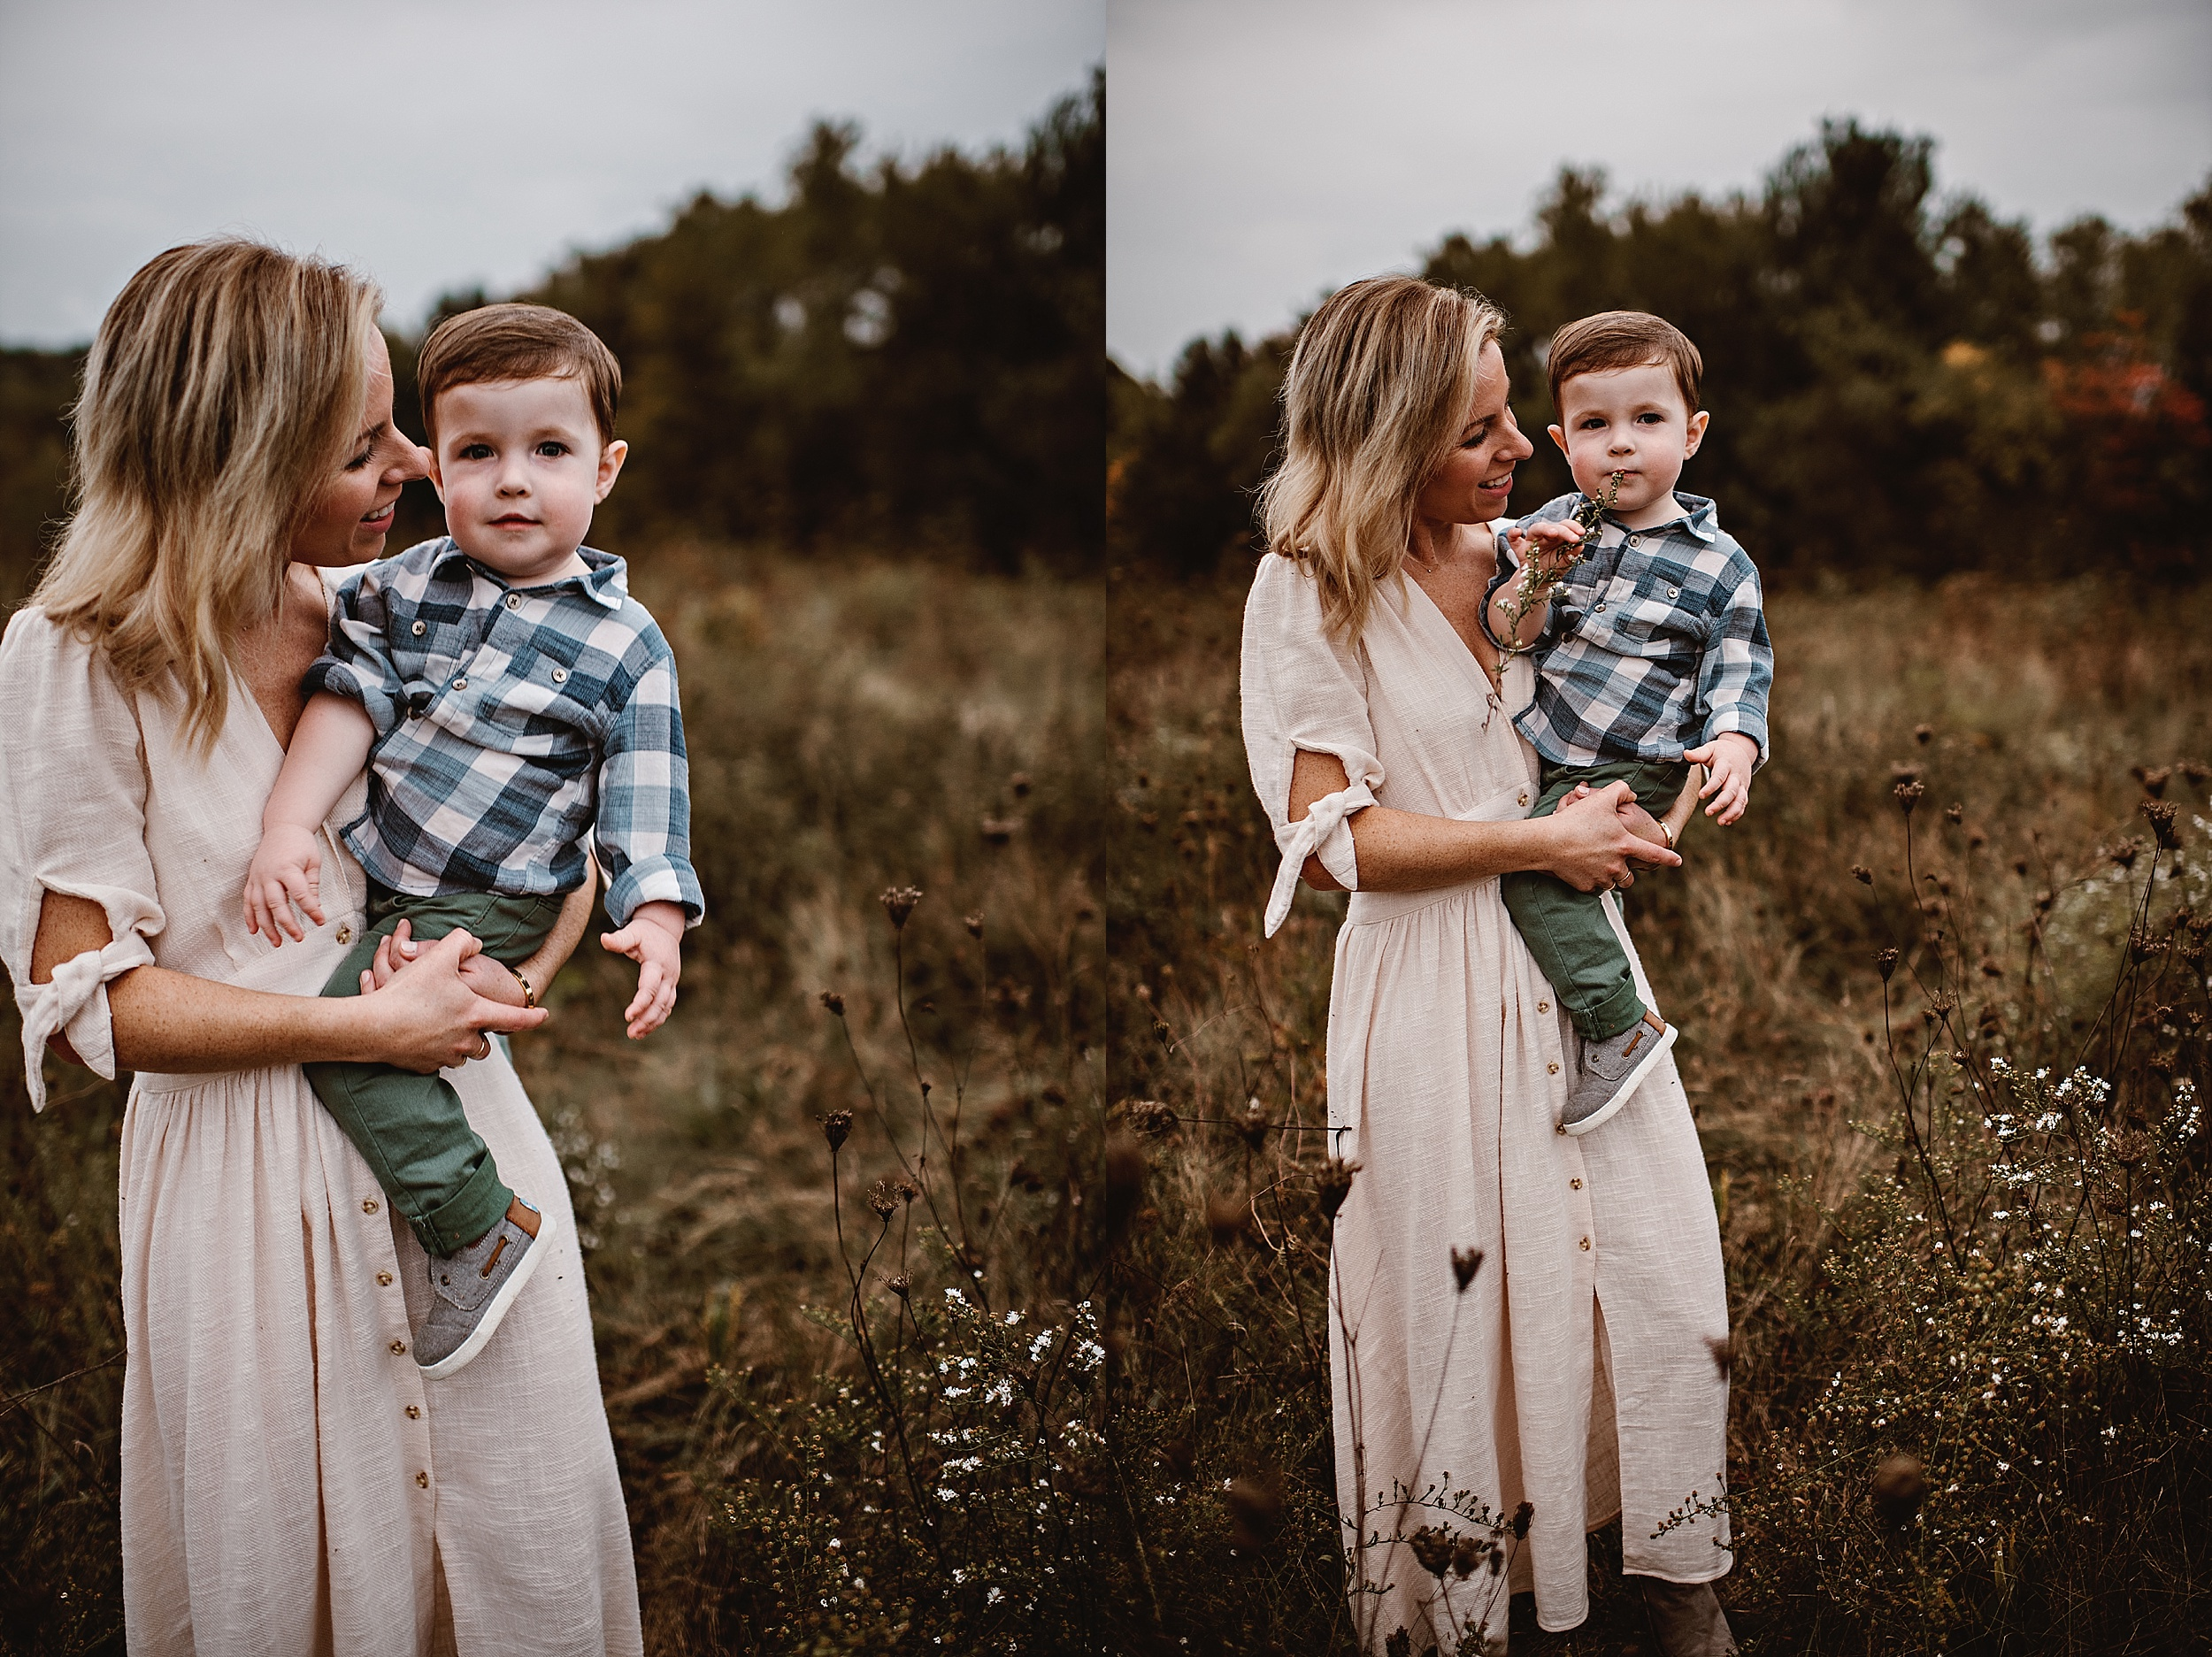 lauren-grayson-photography-portrait-artist-akron-cleveland-ohio-photographer-family-session-fields-sunset-fall_0191.jpg